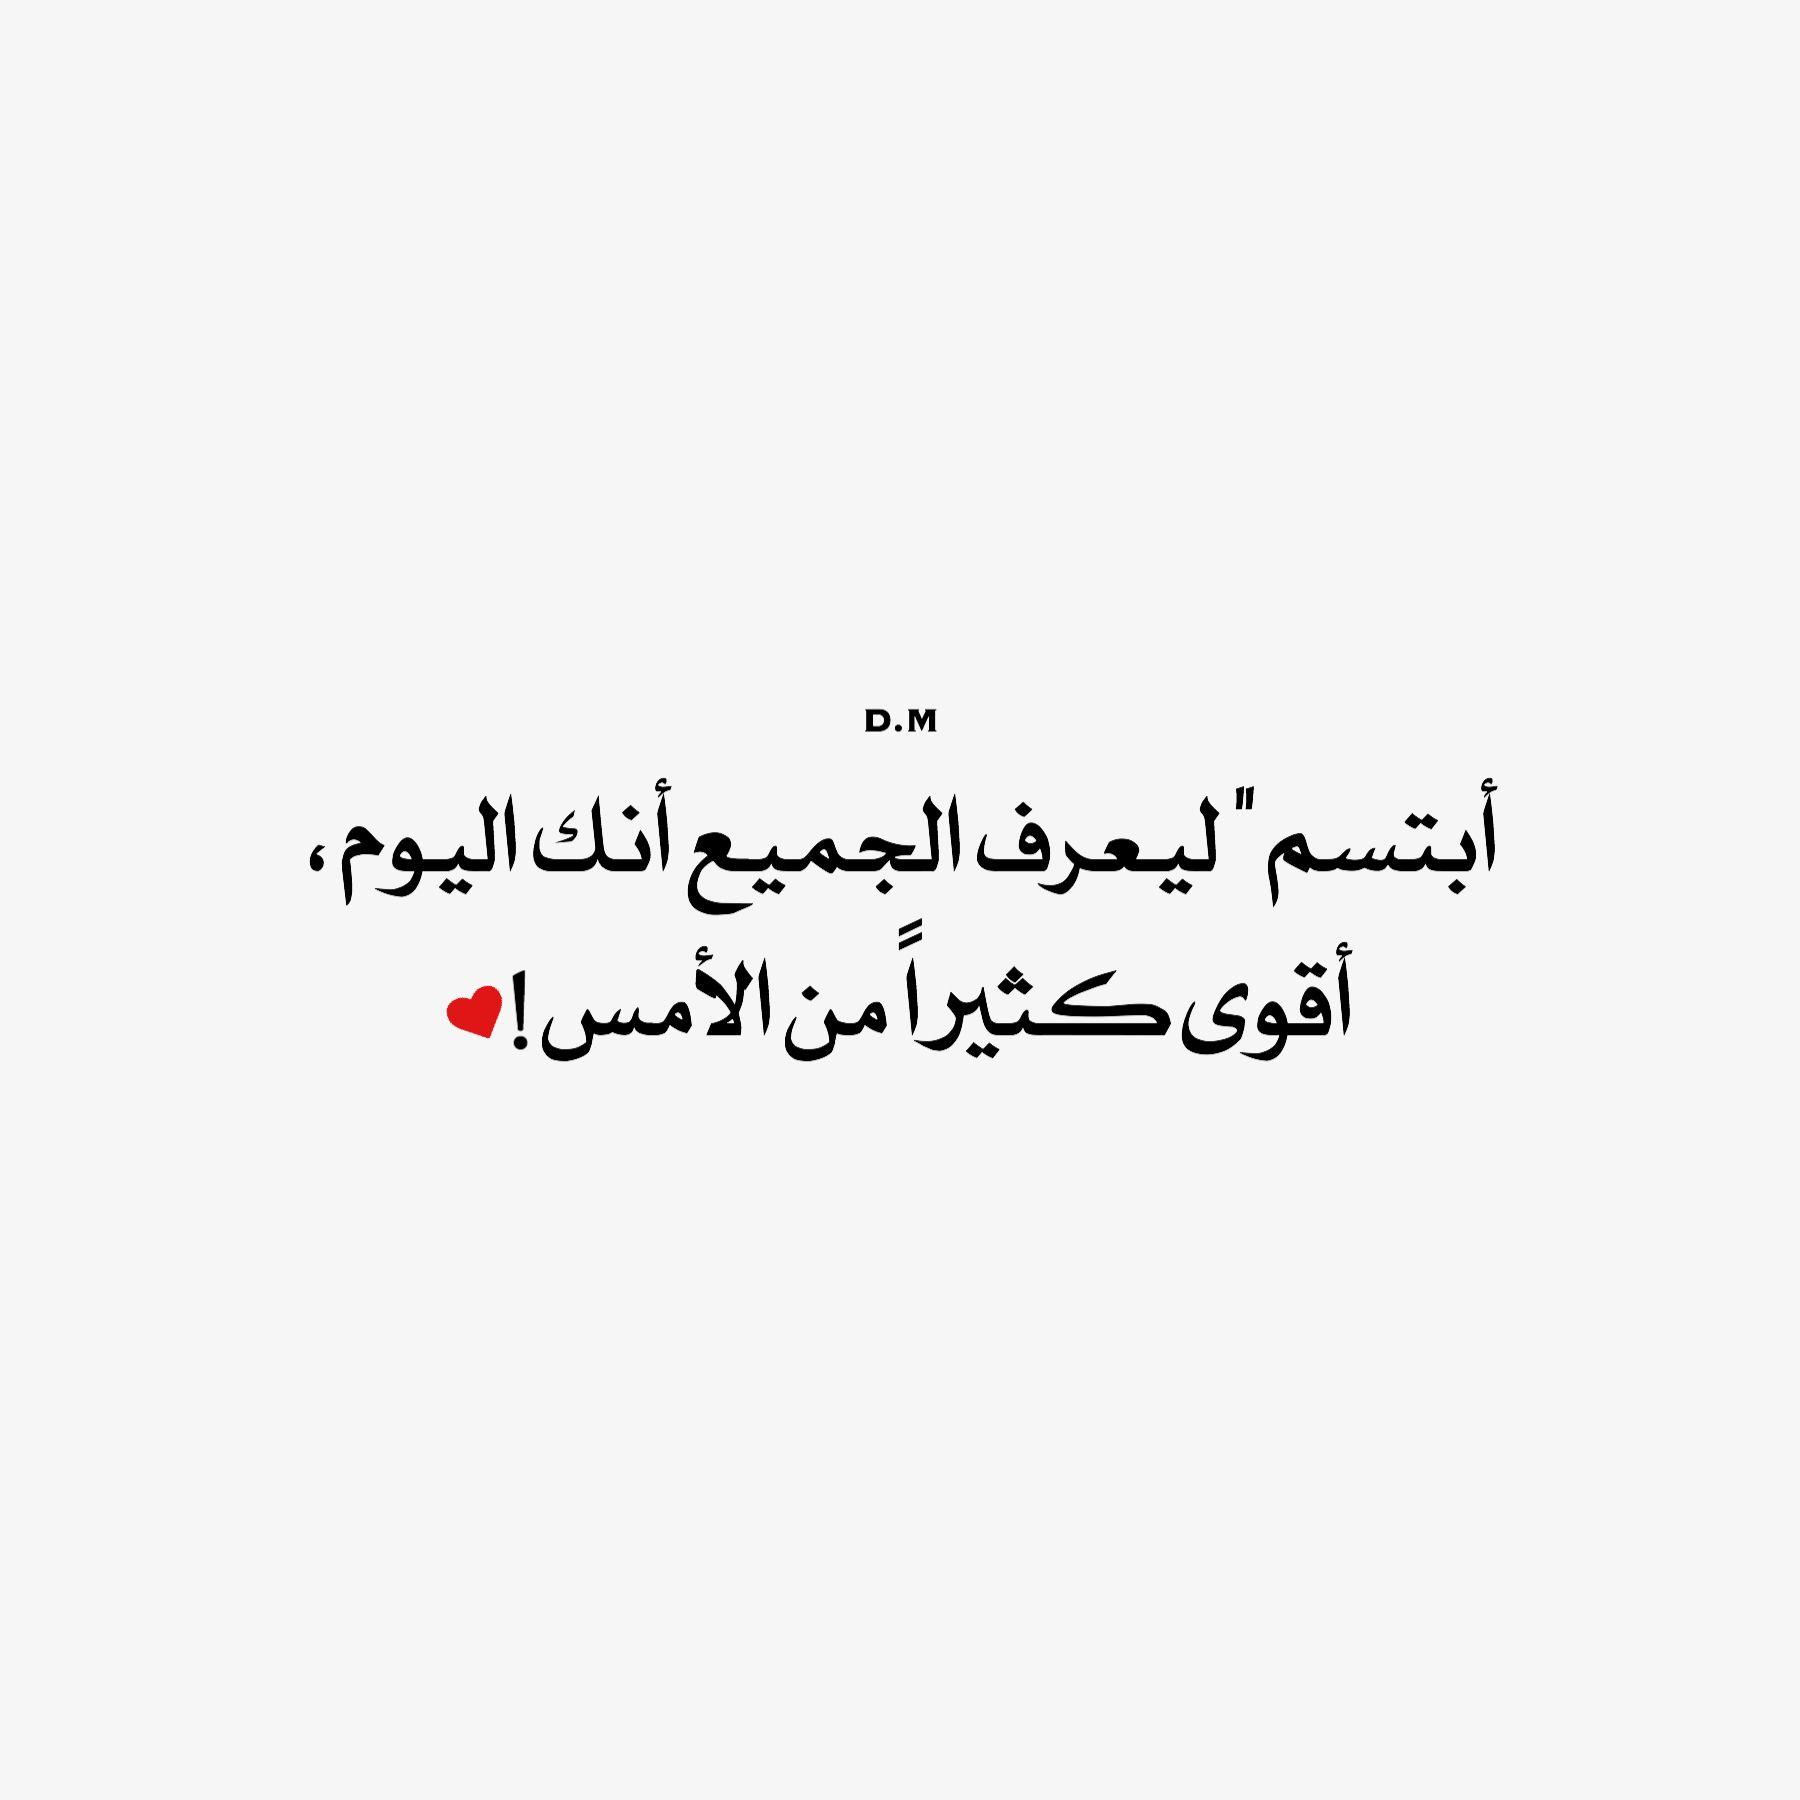 إبتسم حچي عراقي حچي عراقي حجي عراقي إقتباسات اقتباسات فصيح حب غزل عشق شتاء D M Dm Dmk Mk Alls Dmsh Quotes Arabic Calligraphy Calligraphy